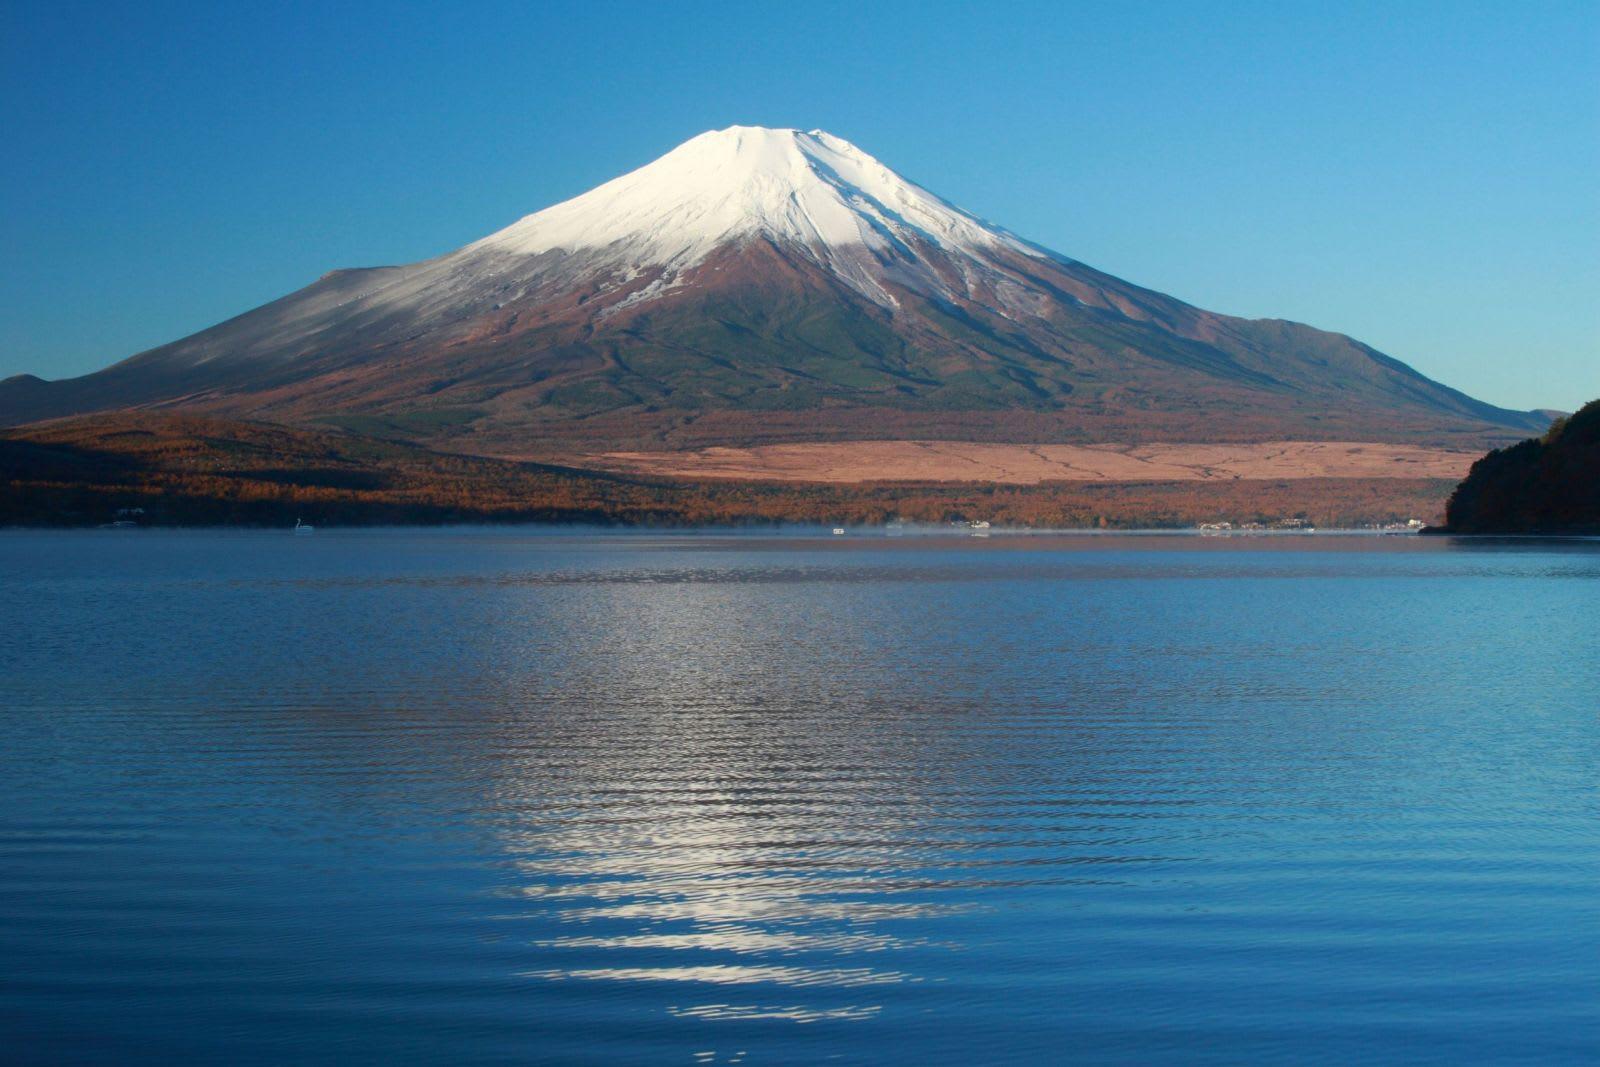 Pokemon Go日本 文 化 遺 產 , 富 士 山 (圖片來源:http://goo.gl/xZLs7F)